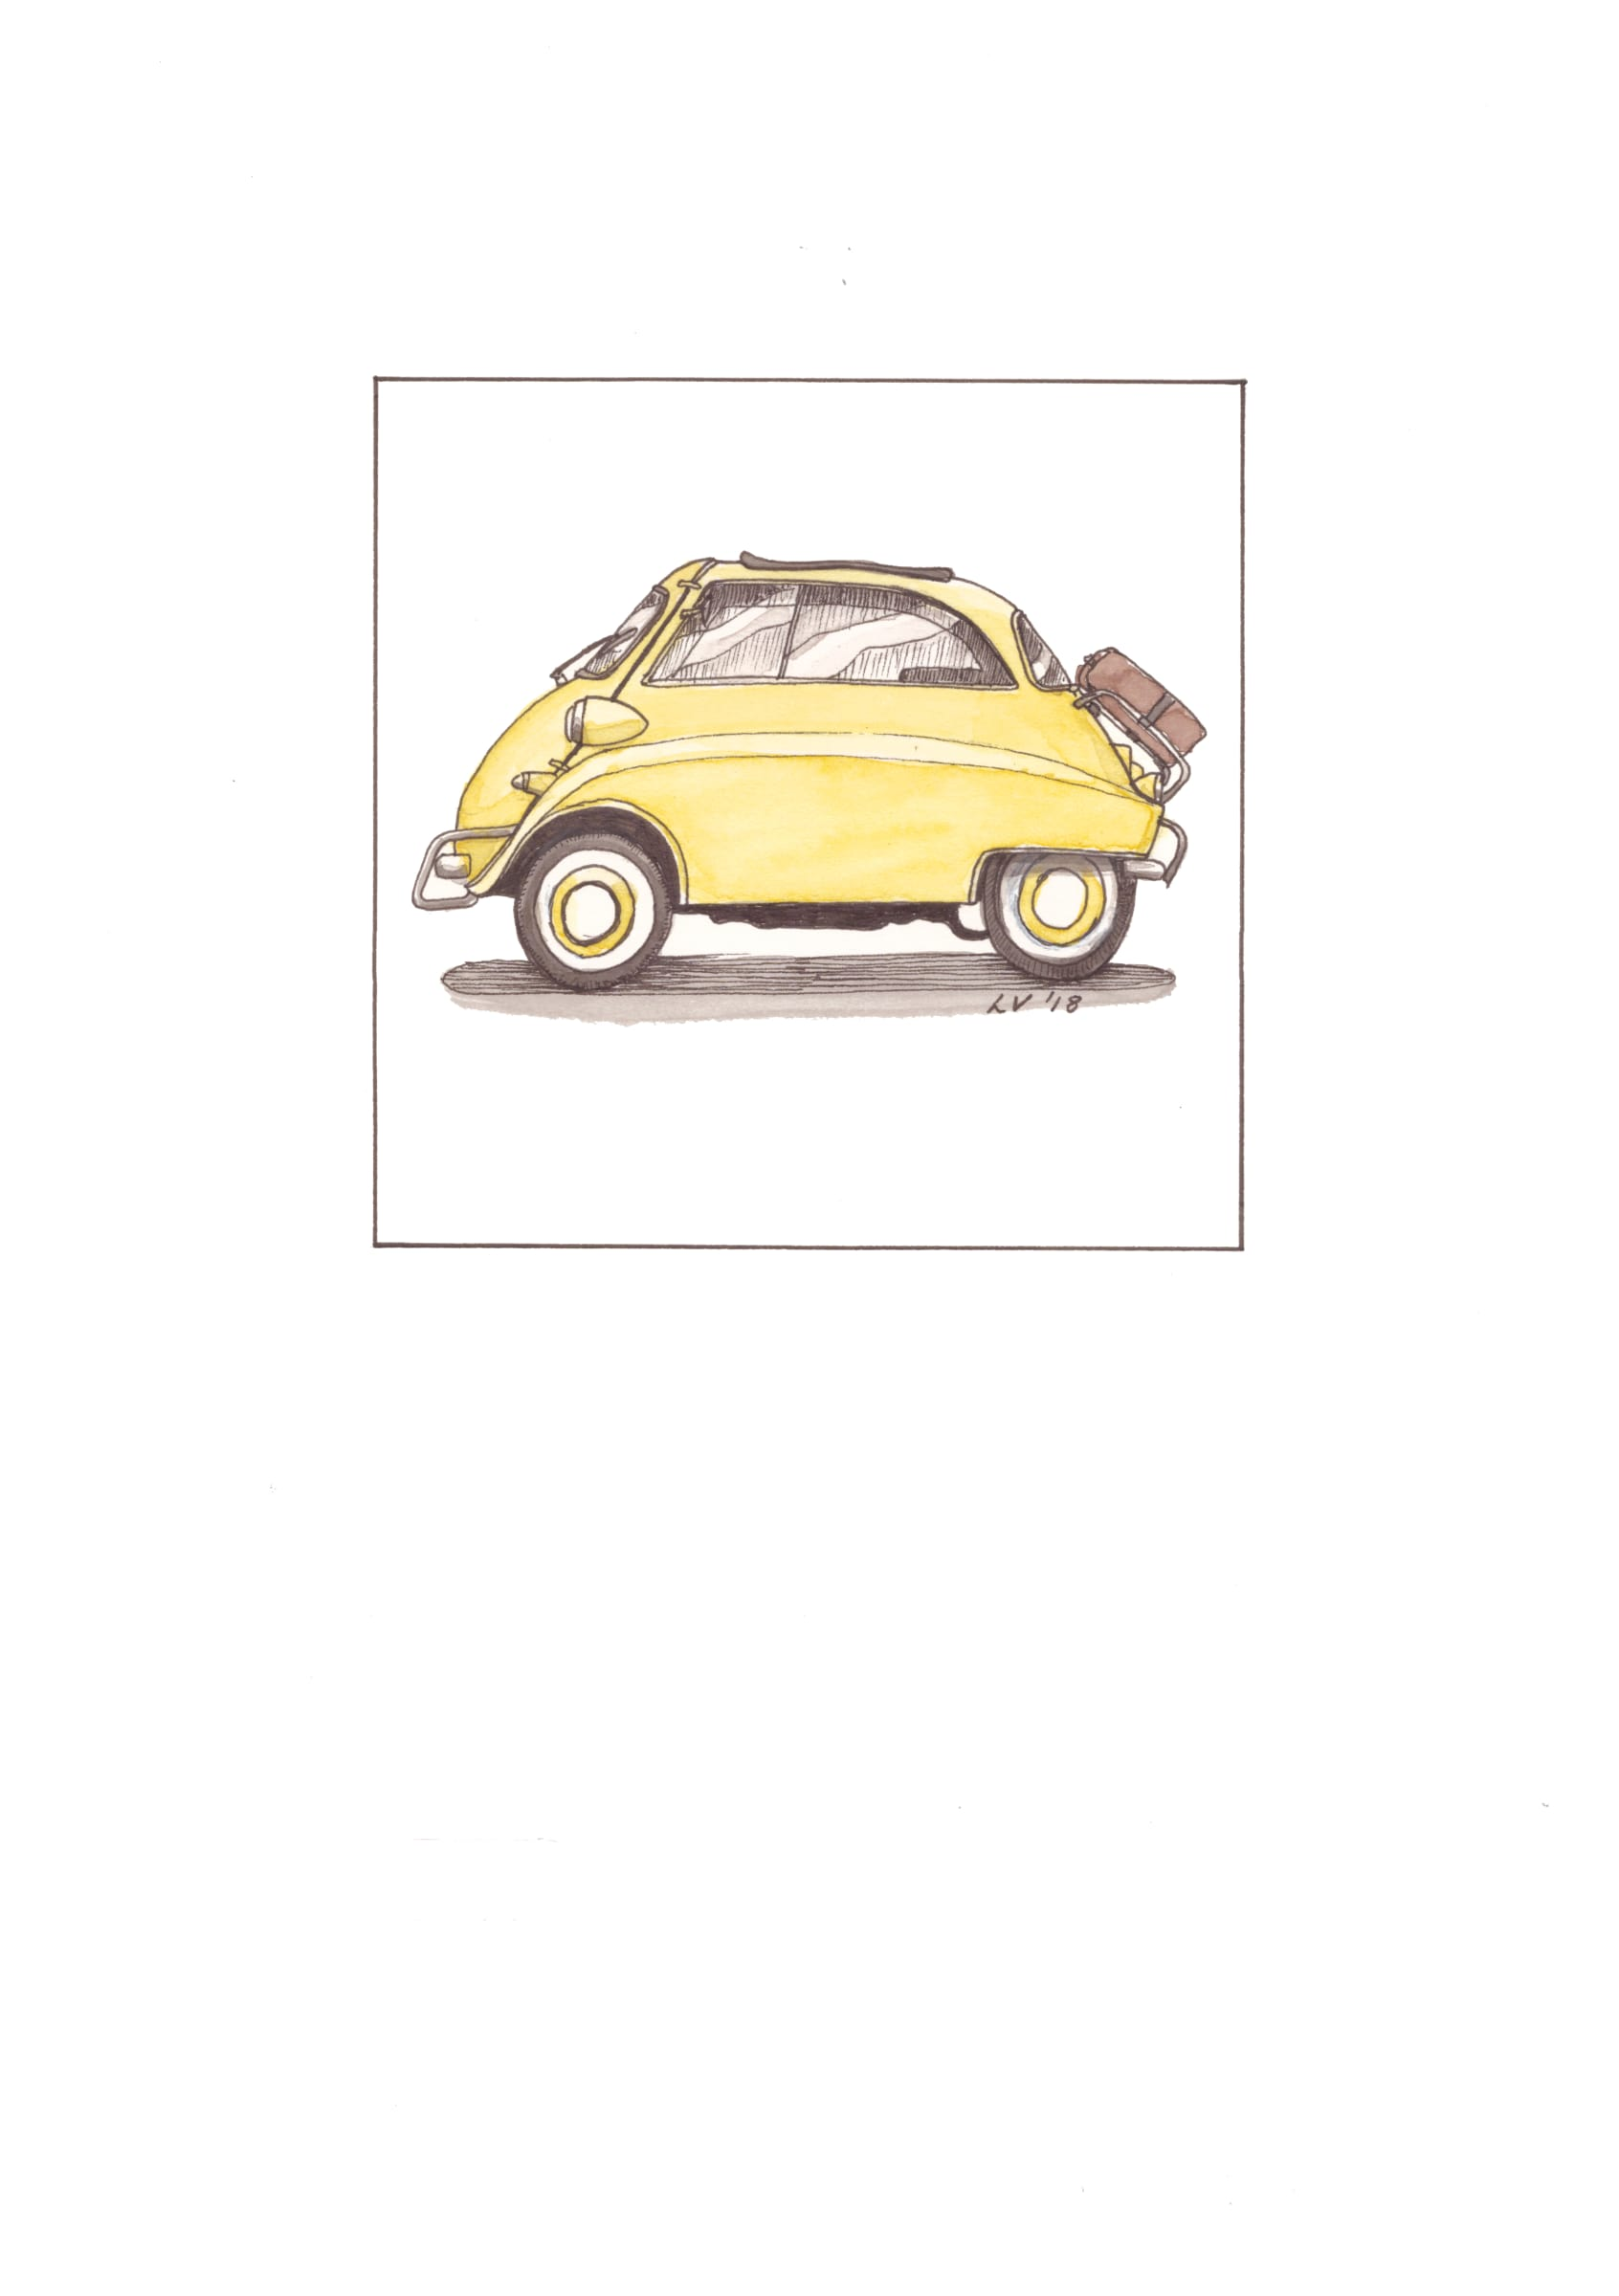 <span class=&#34;link fancybox-details-link&#34;><a href=&#34;/artists/71-leonora-venter/works/2258-leonora-venter-bmw-isetta-2018/&#34;>View Detail Page</a></span><div class=&#34;artist&#34;><strong>Leonora Venter</strong></div> <div class=&#34;title&#34;><em>Bmw Isetta</em>, 2018</div> <div class=&#34;medium&#34;>Coloured Ink On Paper</div> <div class=&#34;dimensions&#34;>14.5cm x 10.5cm</div><div class=&#34;price&#34;>R600.00</div>